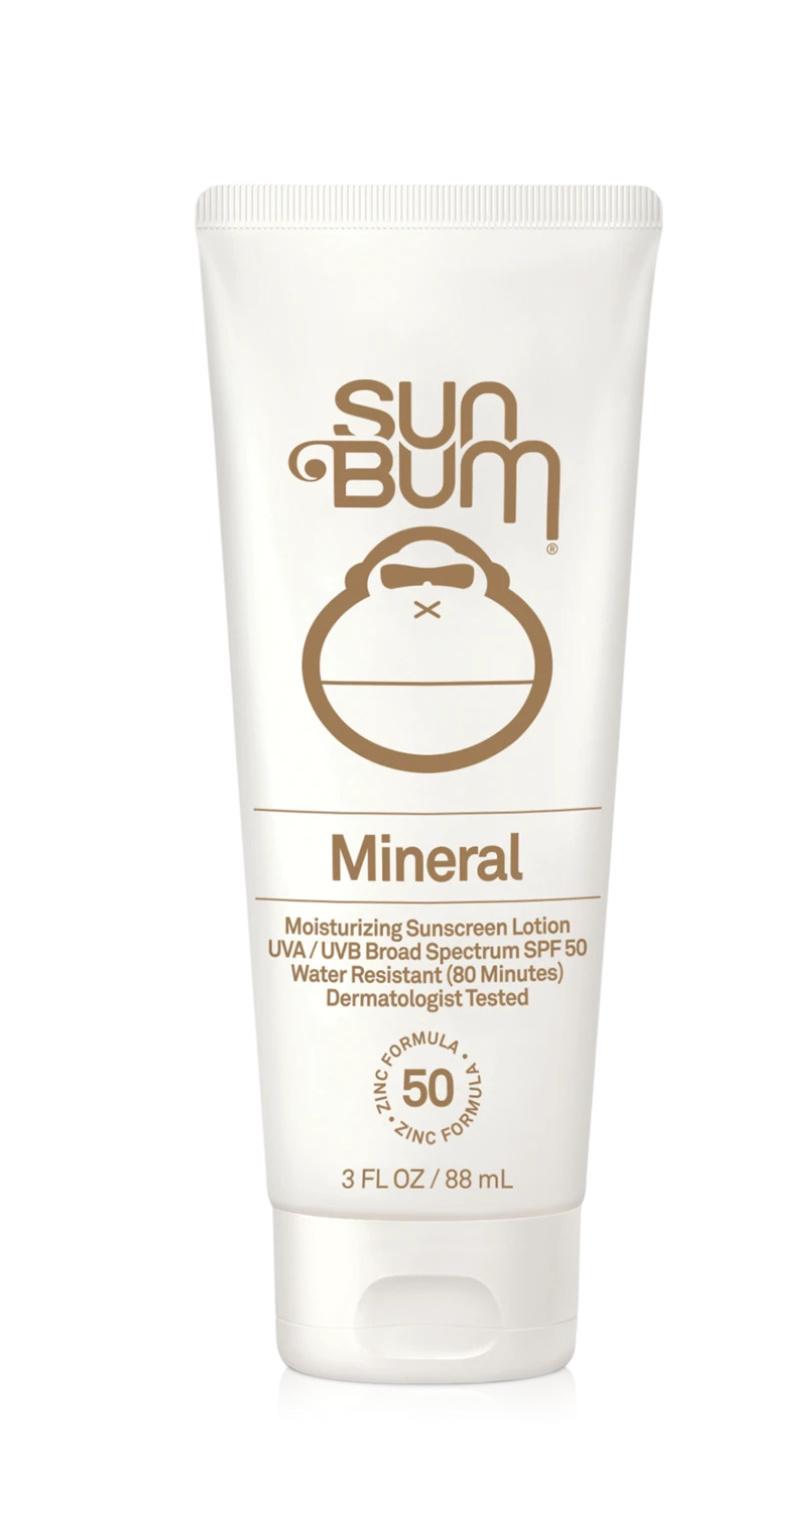 Sun Bum Sun Bum Mineral SPF 50 Cream